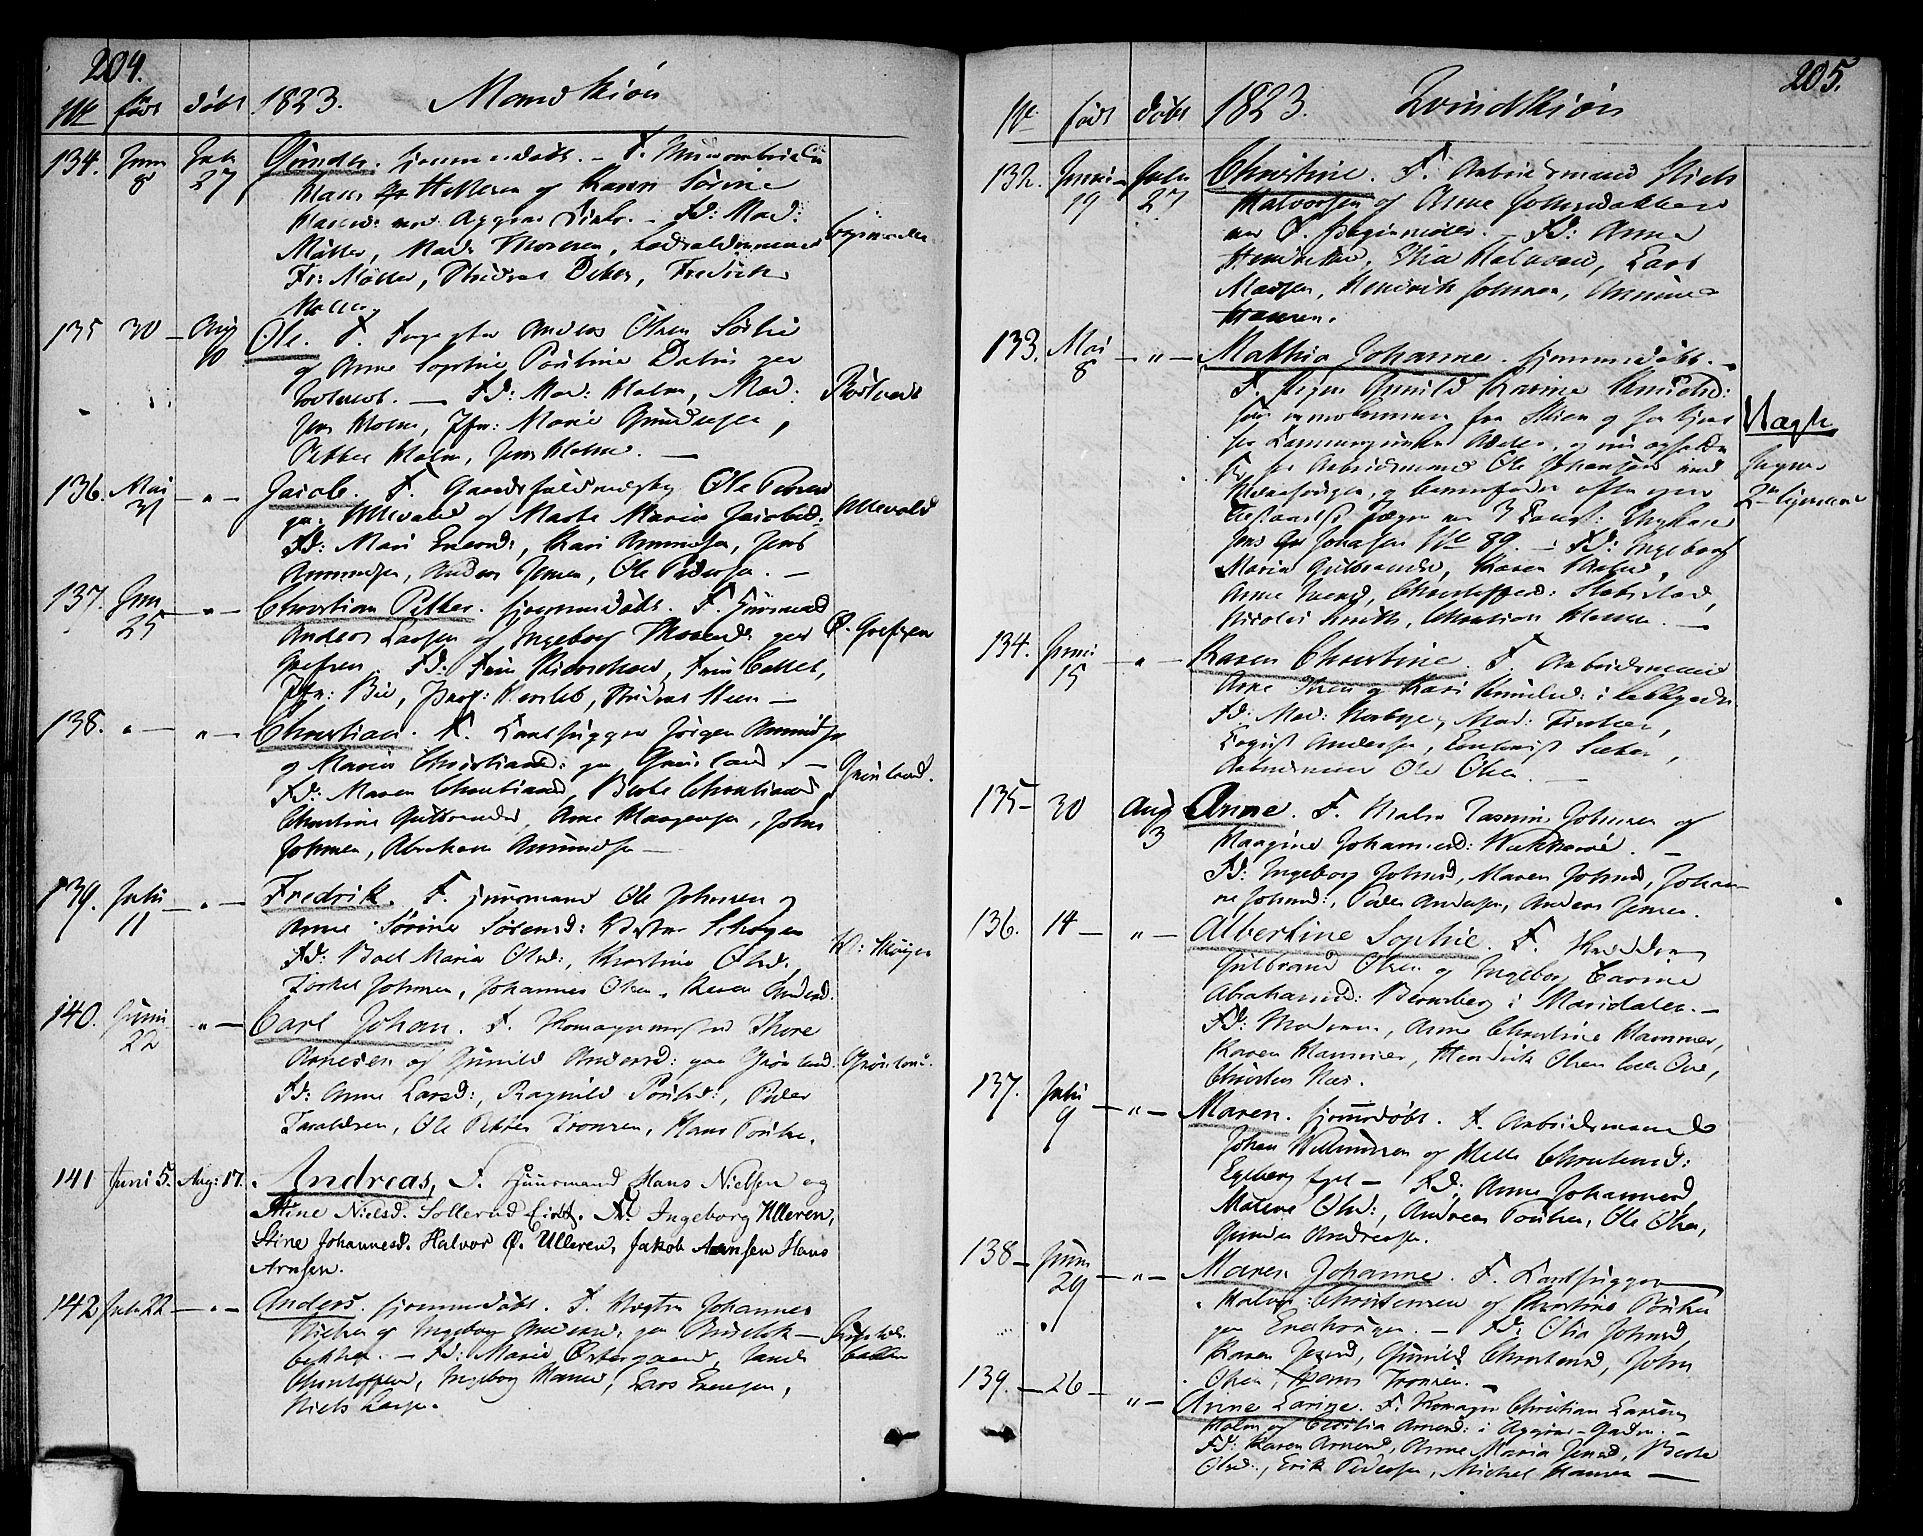 SAO, Aker prestekontor kirkebøker, F/L0012: Parish register (official) no. 12, 1819-1828, p. 204-205